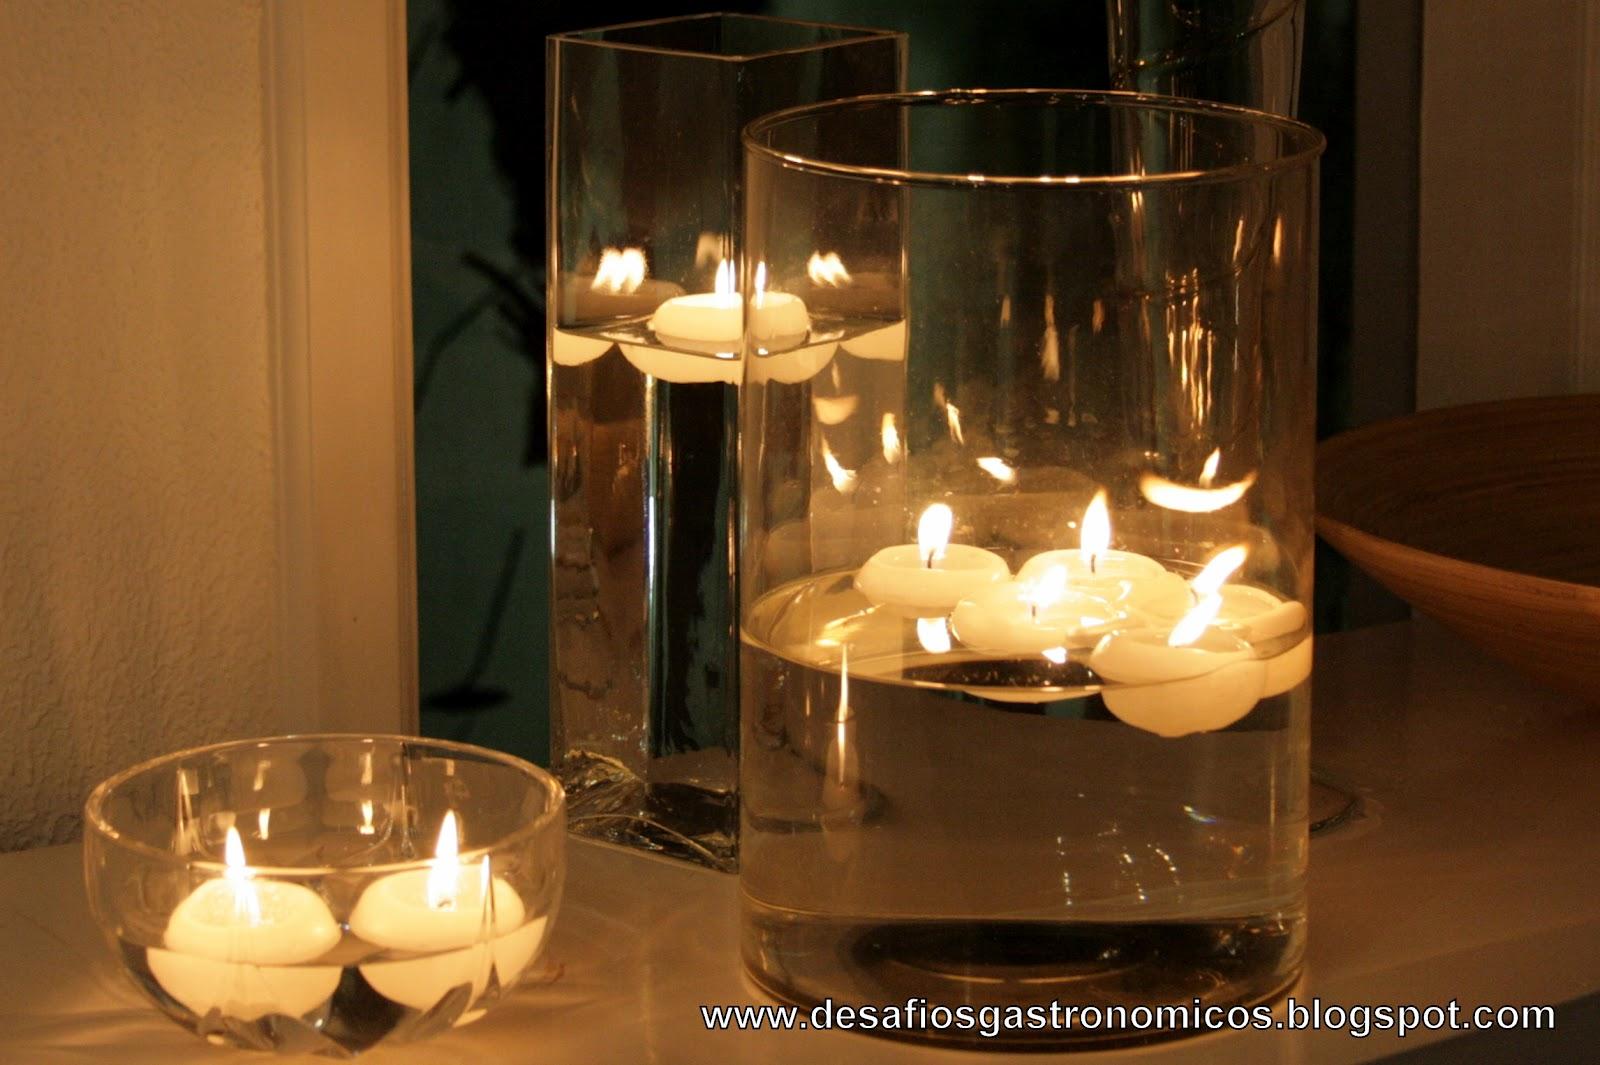 Desafios gastron micos desafio decorar a casa com velas muitas velas - Velas de agua ...